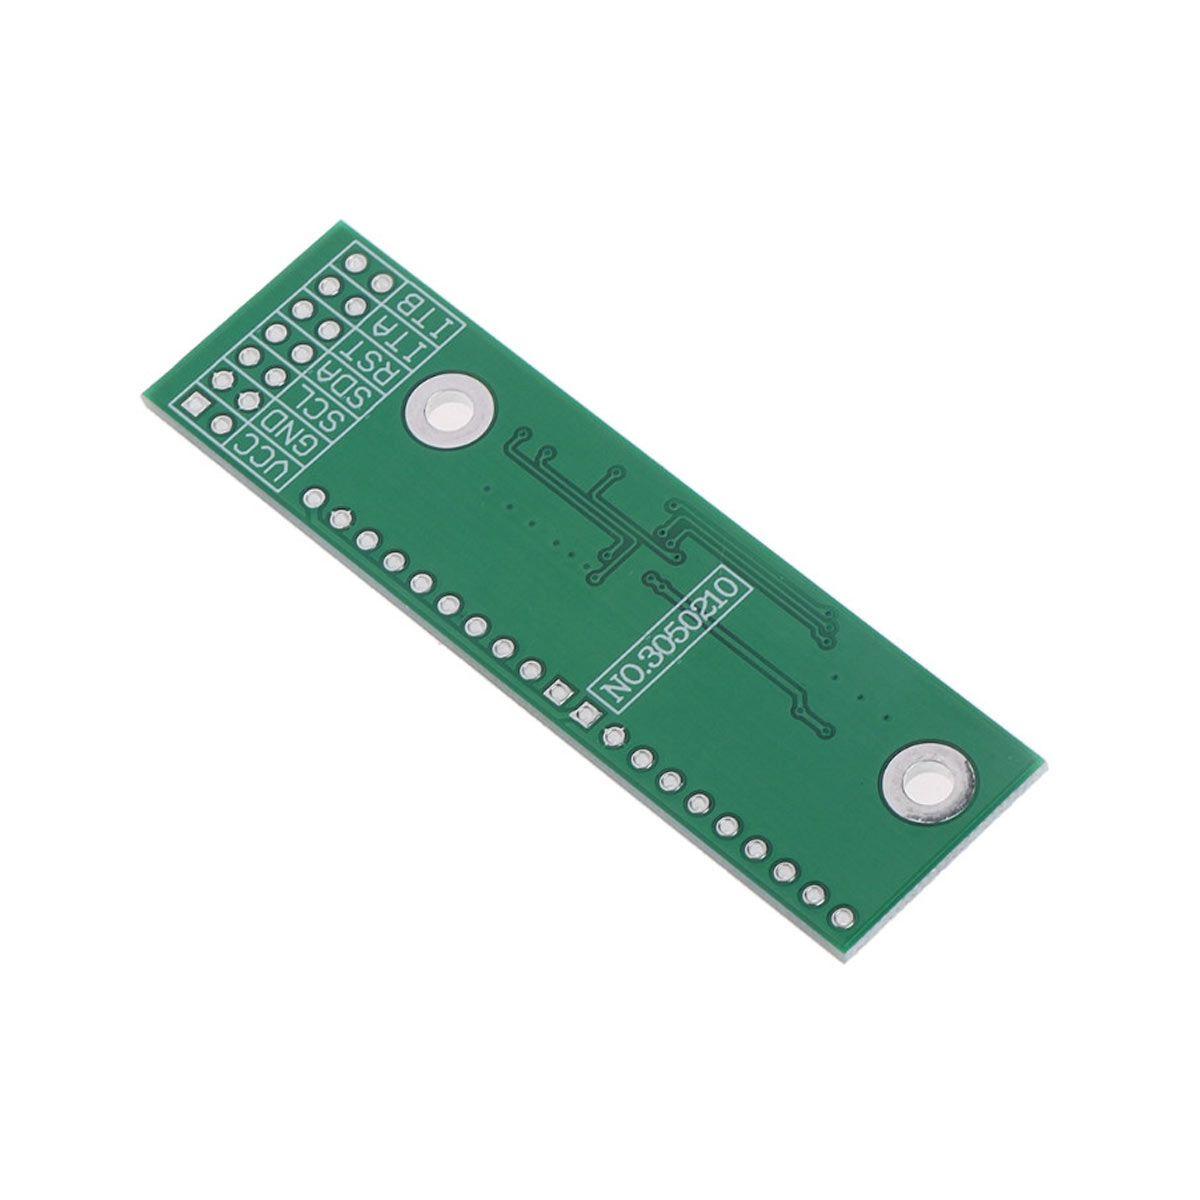 Módulo Expansor de Portas de Entrada / Saída Digital 16 Bits Interface I2c - MCP23017